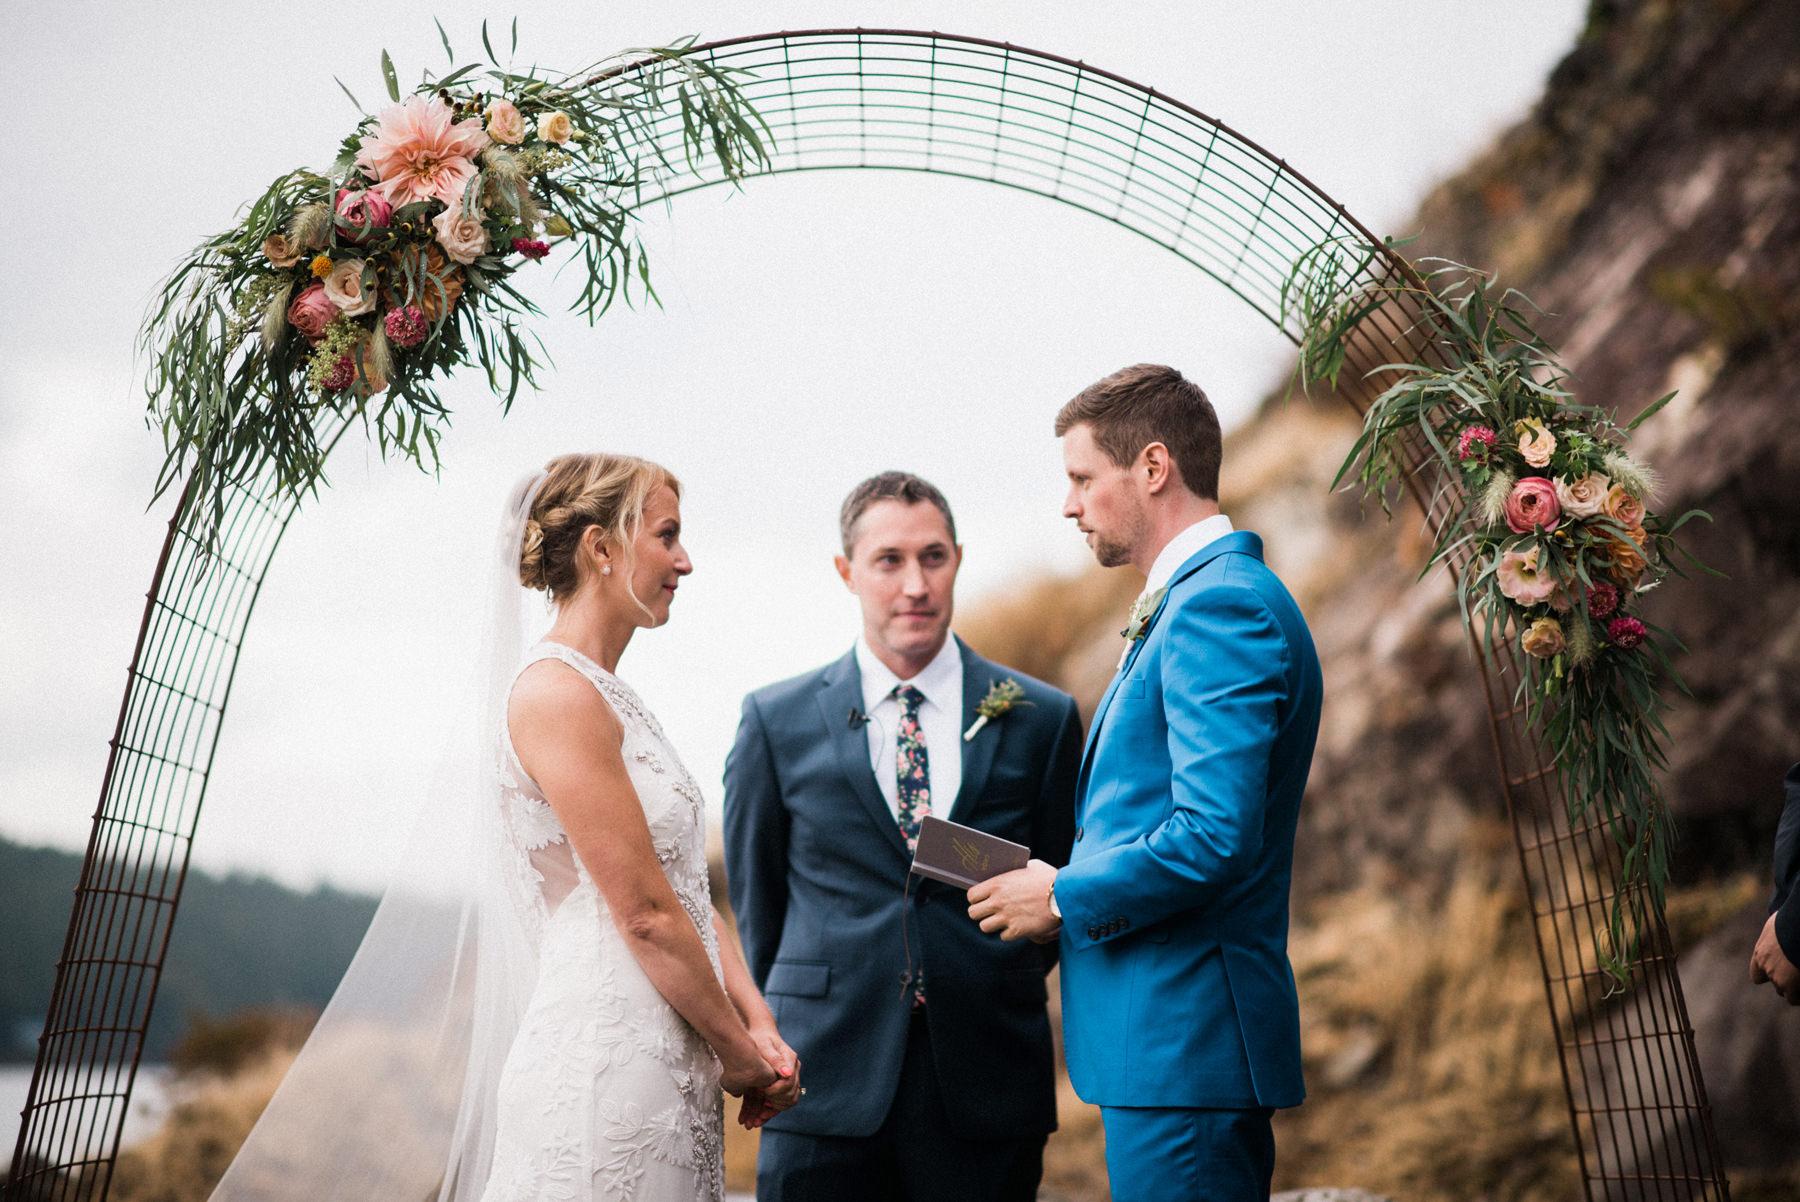 328-colorful-outdoor-lopez-island-wedding.jpg